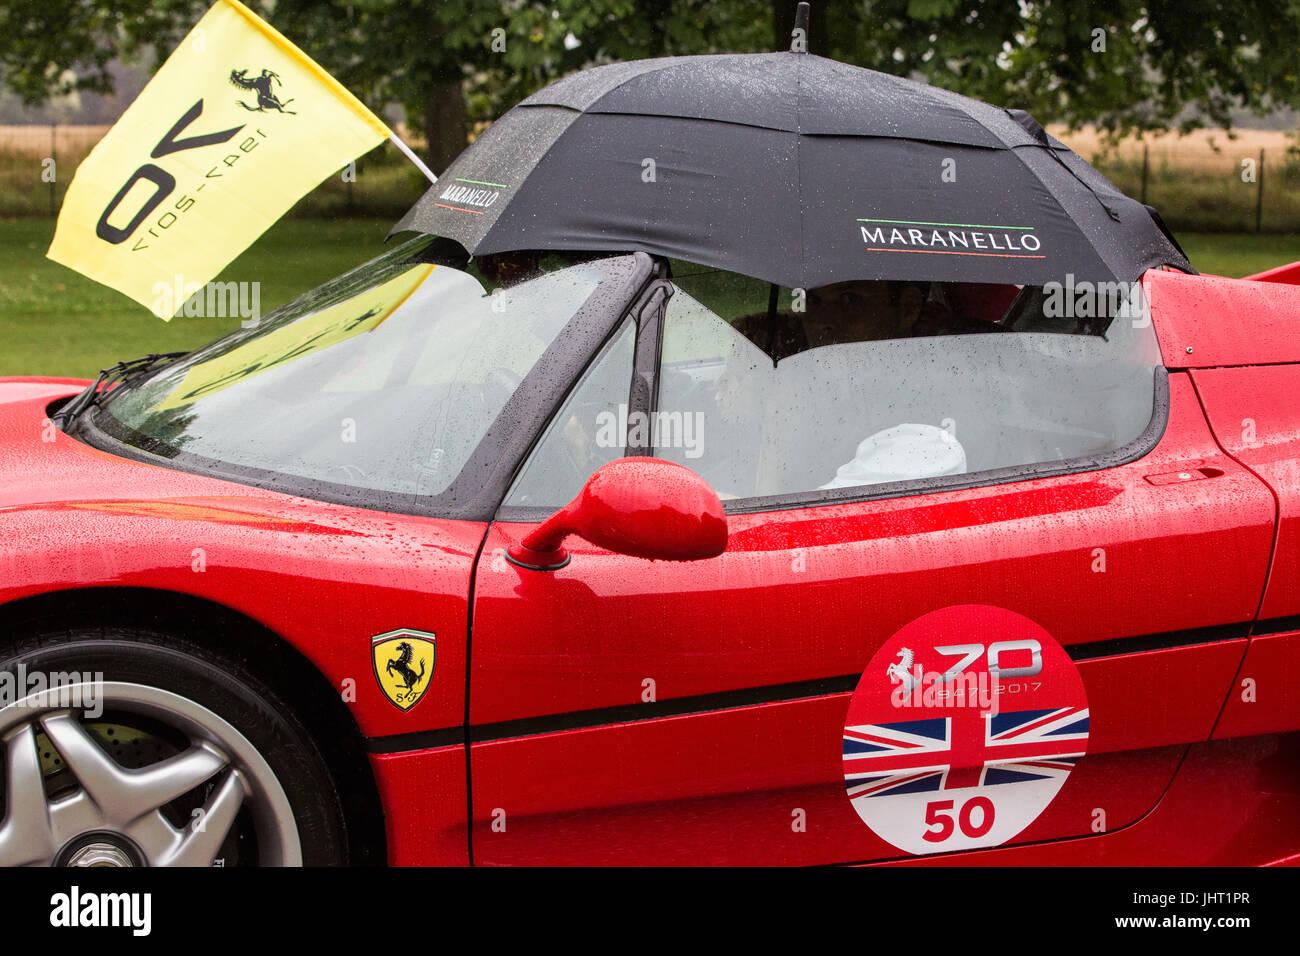 Ferrari Flag Stockfotos & Ferrari Flag Bilder - Alamy